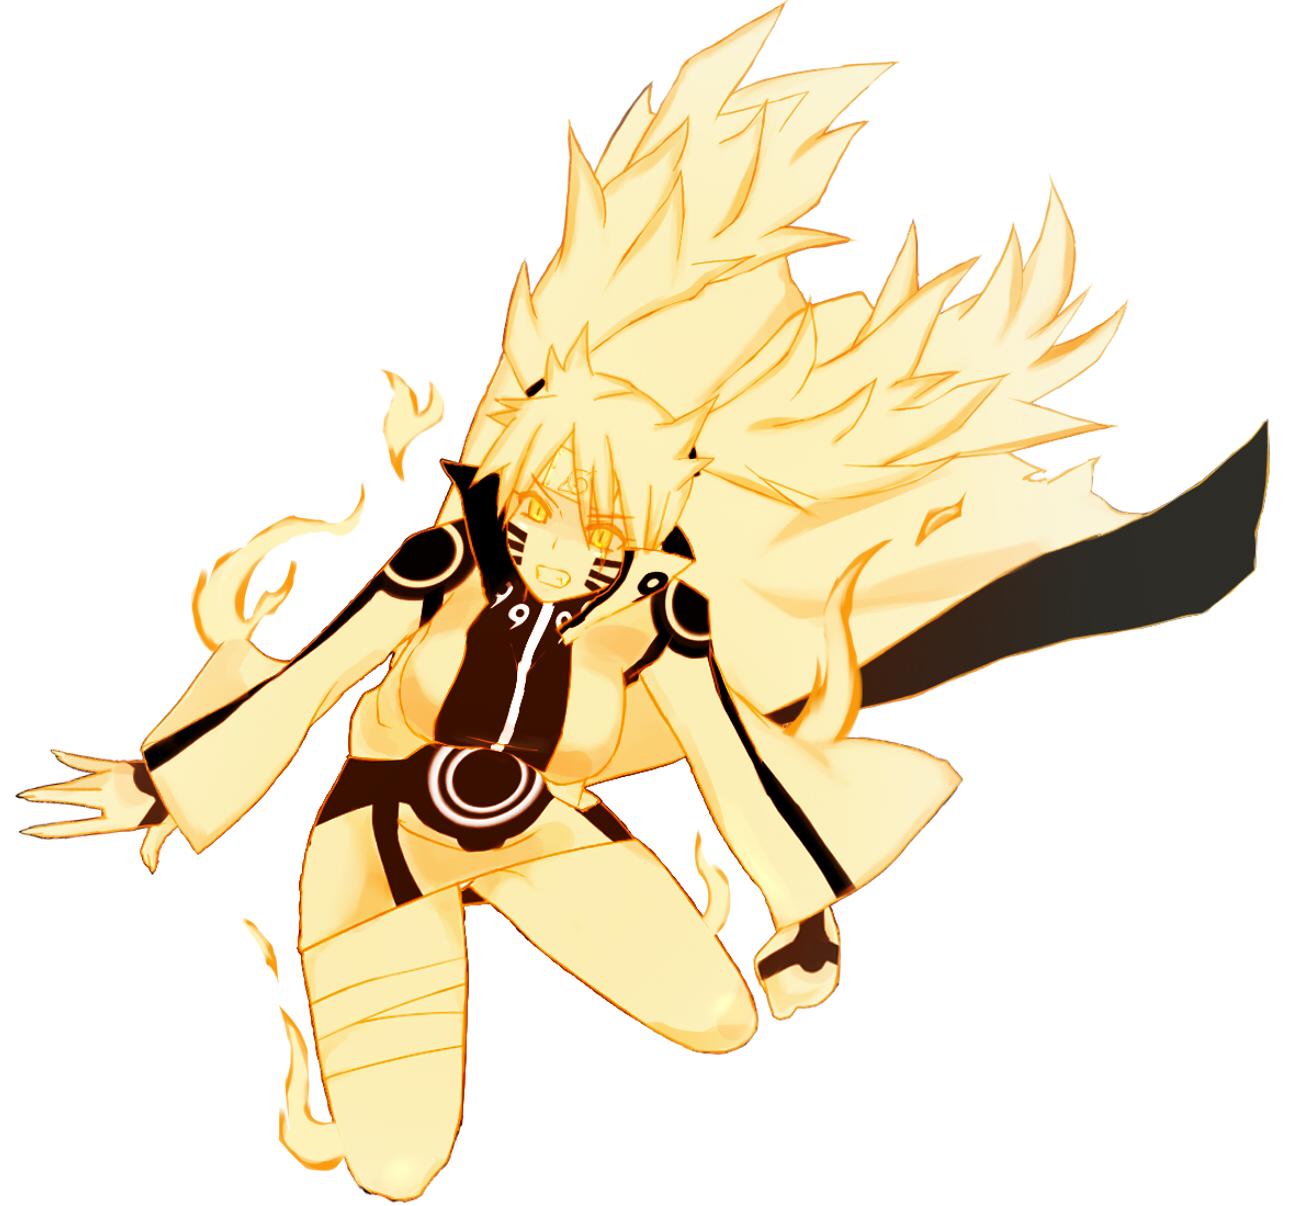 Inicio de Novas Lendas - Angel e Yuuji - Página 8 Uzumaki.Naruto.%28Female%29.full.1555463